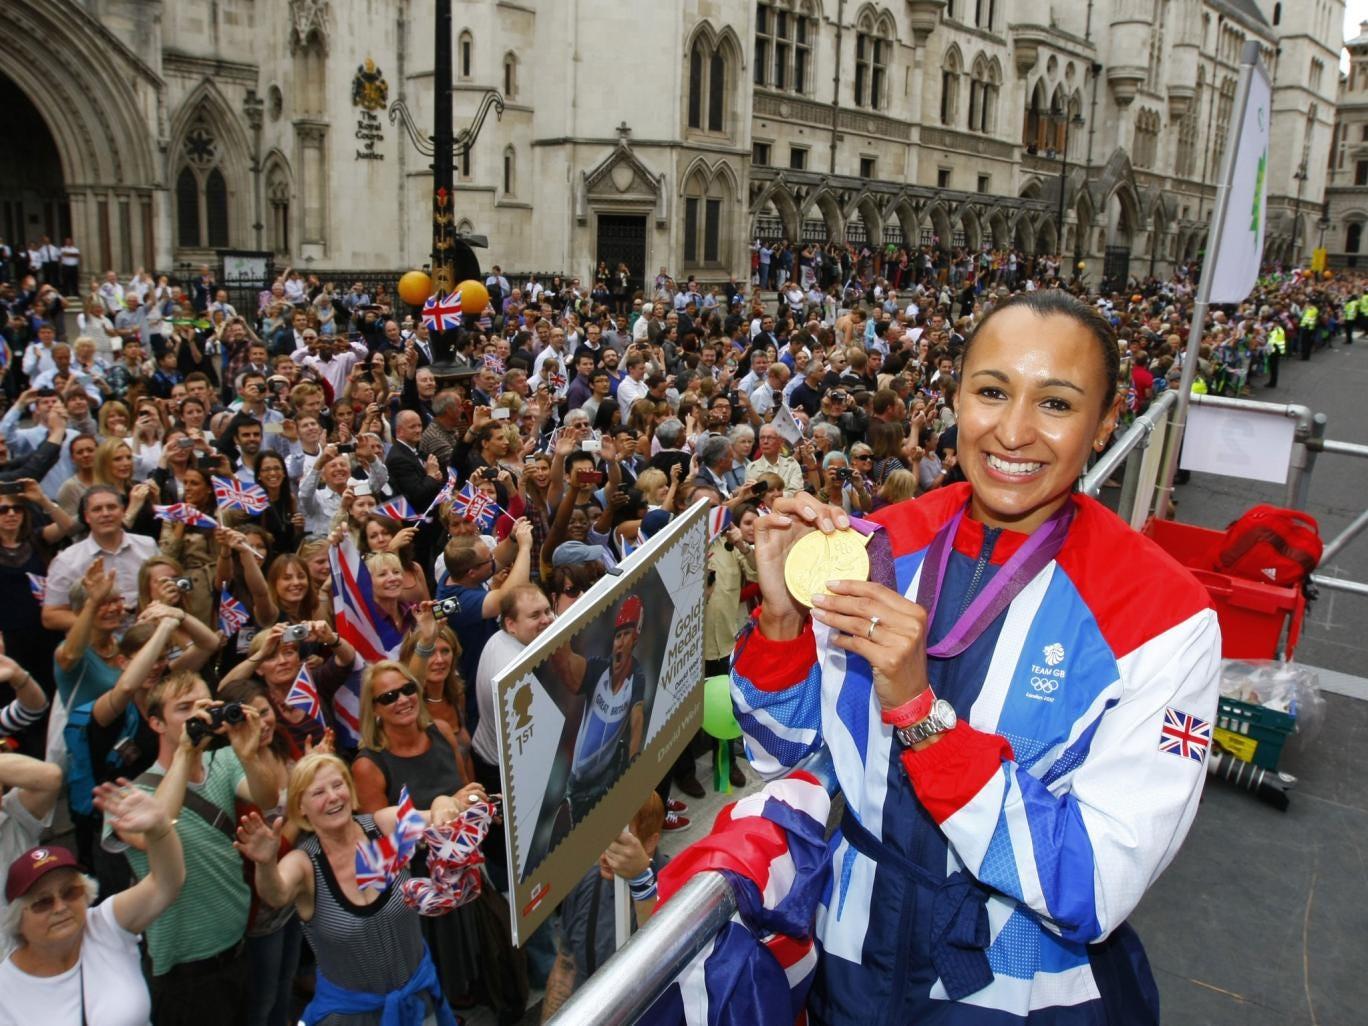 Backing for British talent such as Jess Ennis impressed bidder